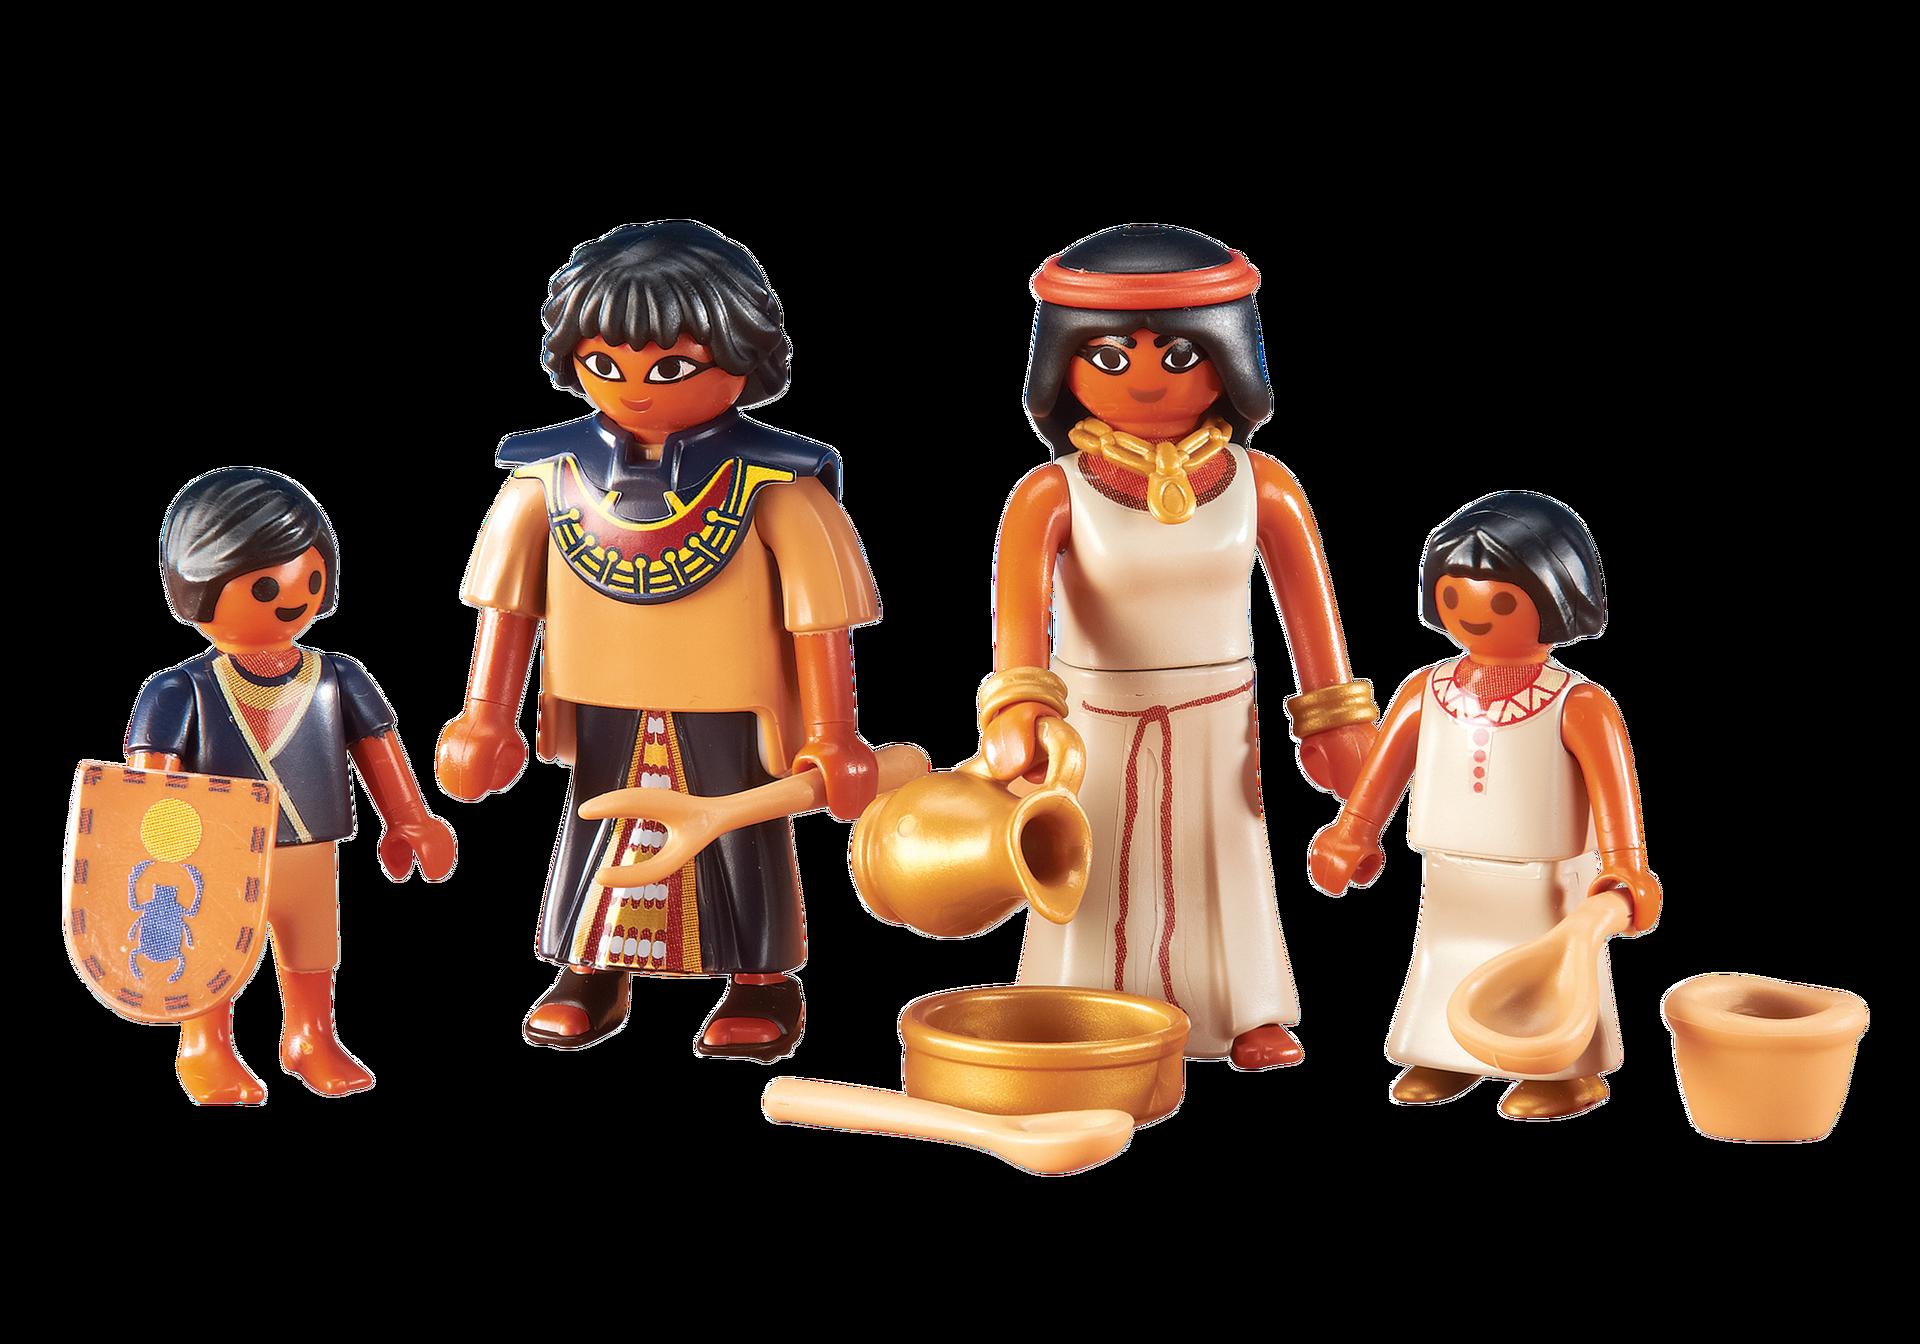 Gypterfamilie 6492 playmobil deutschland - Playmobil egyptien ...